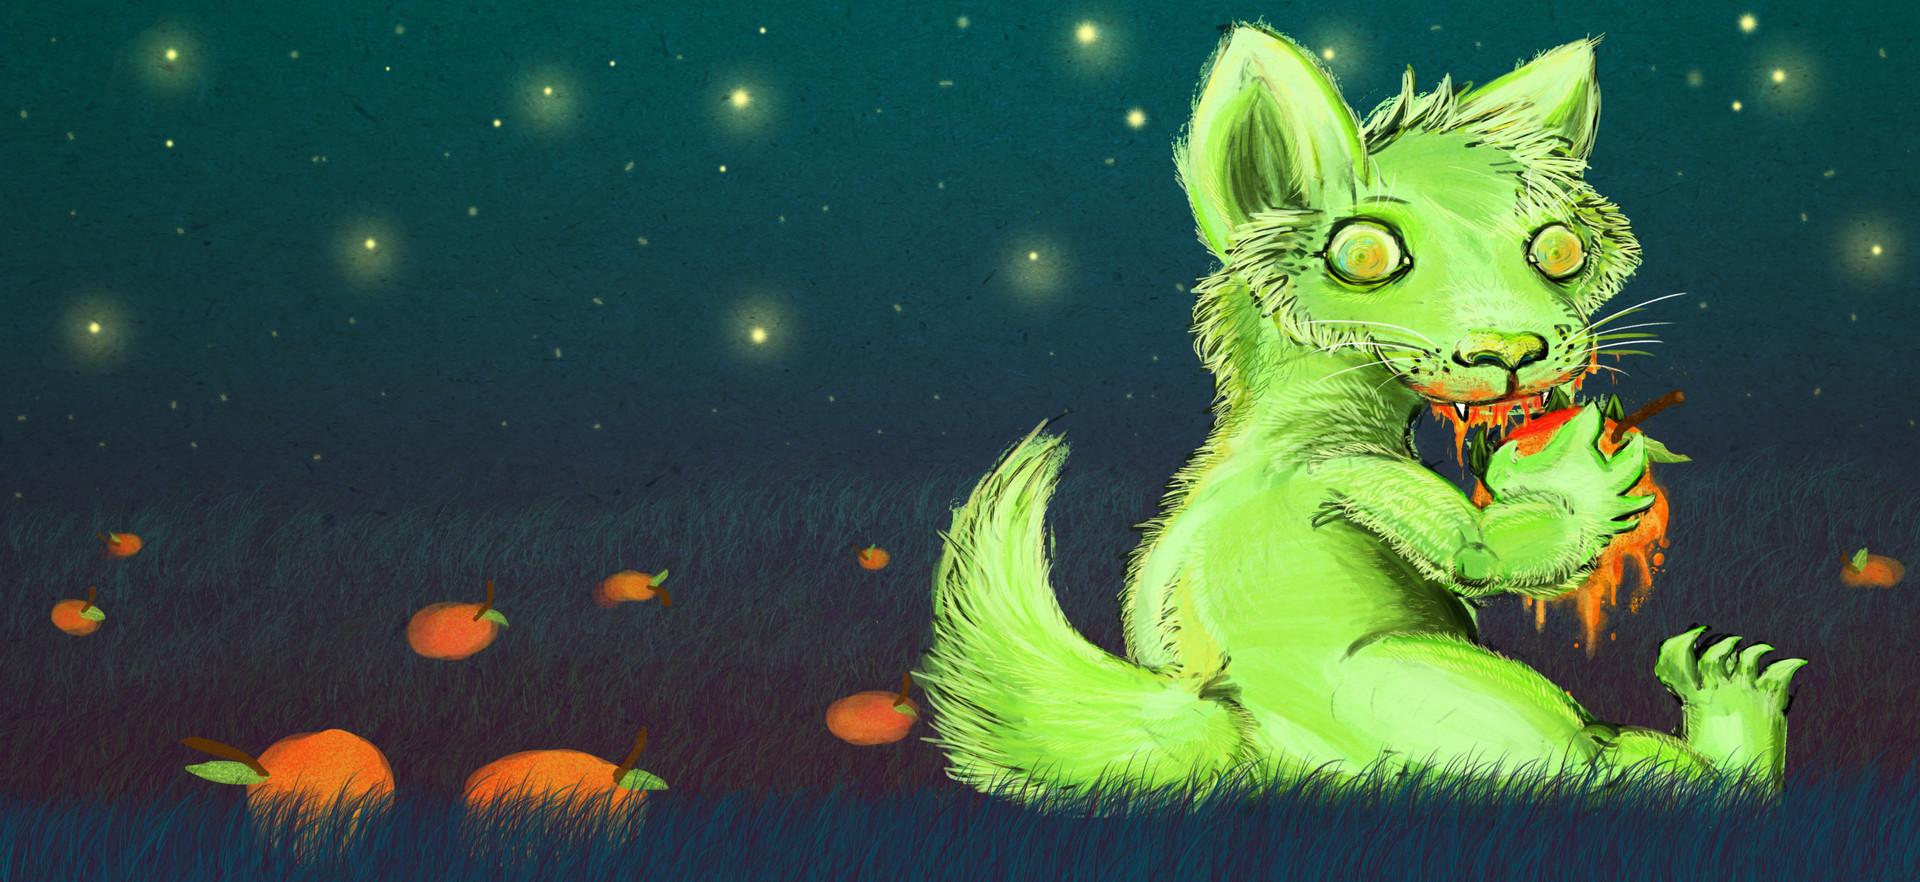 Alexandra hall pinner small green monster post